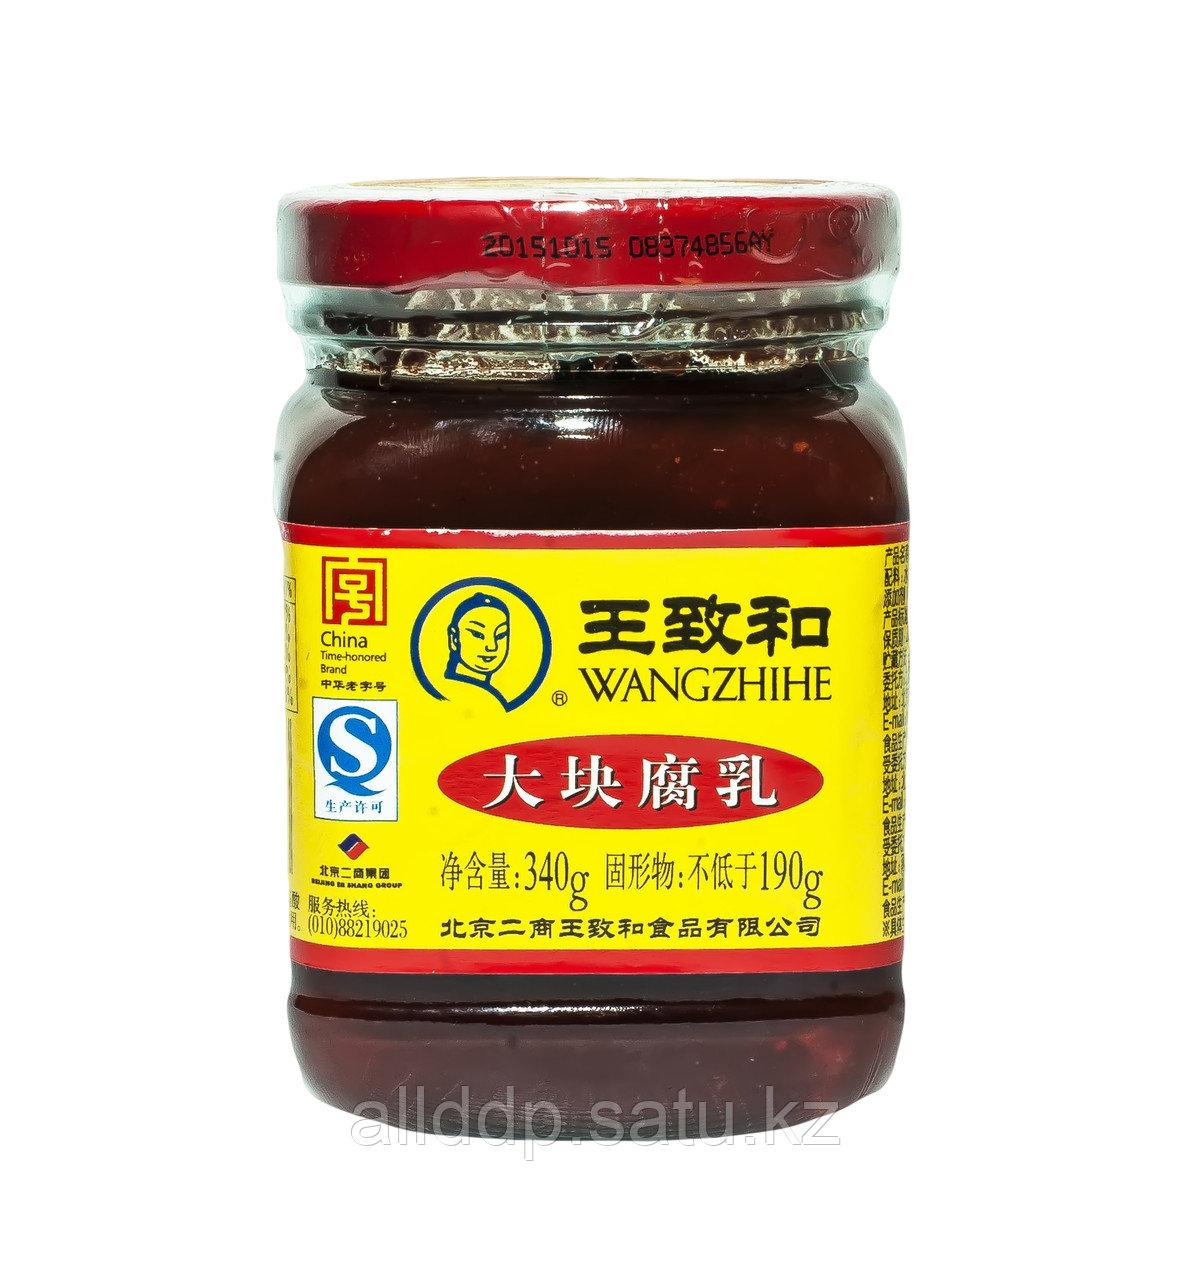 Дофу (соевый сыр) в томате WANGZHINE, 340 г